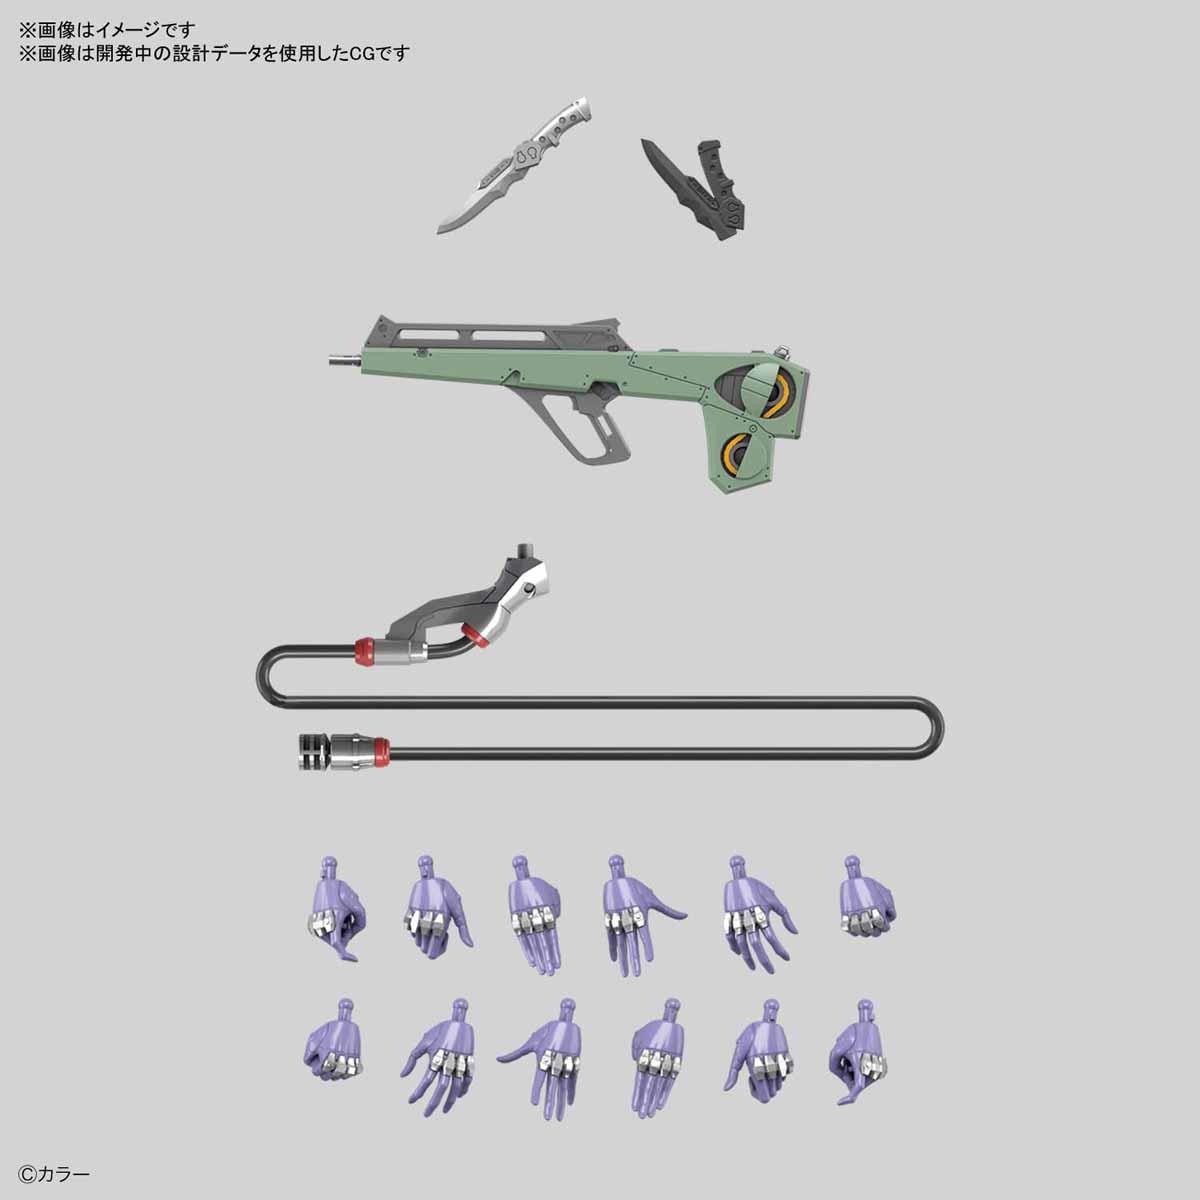 RG『汎用ヒト型決戦兵器 人造人間エヴァンゲリオン初号機』プラモデル-010